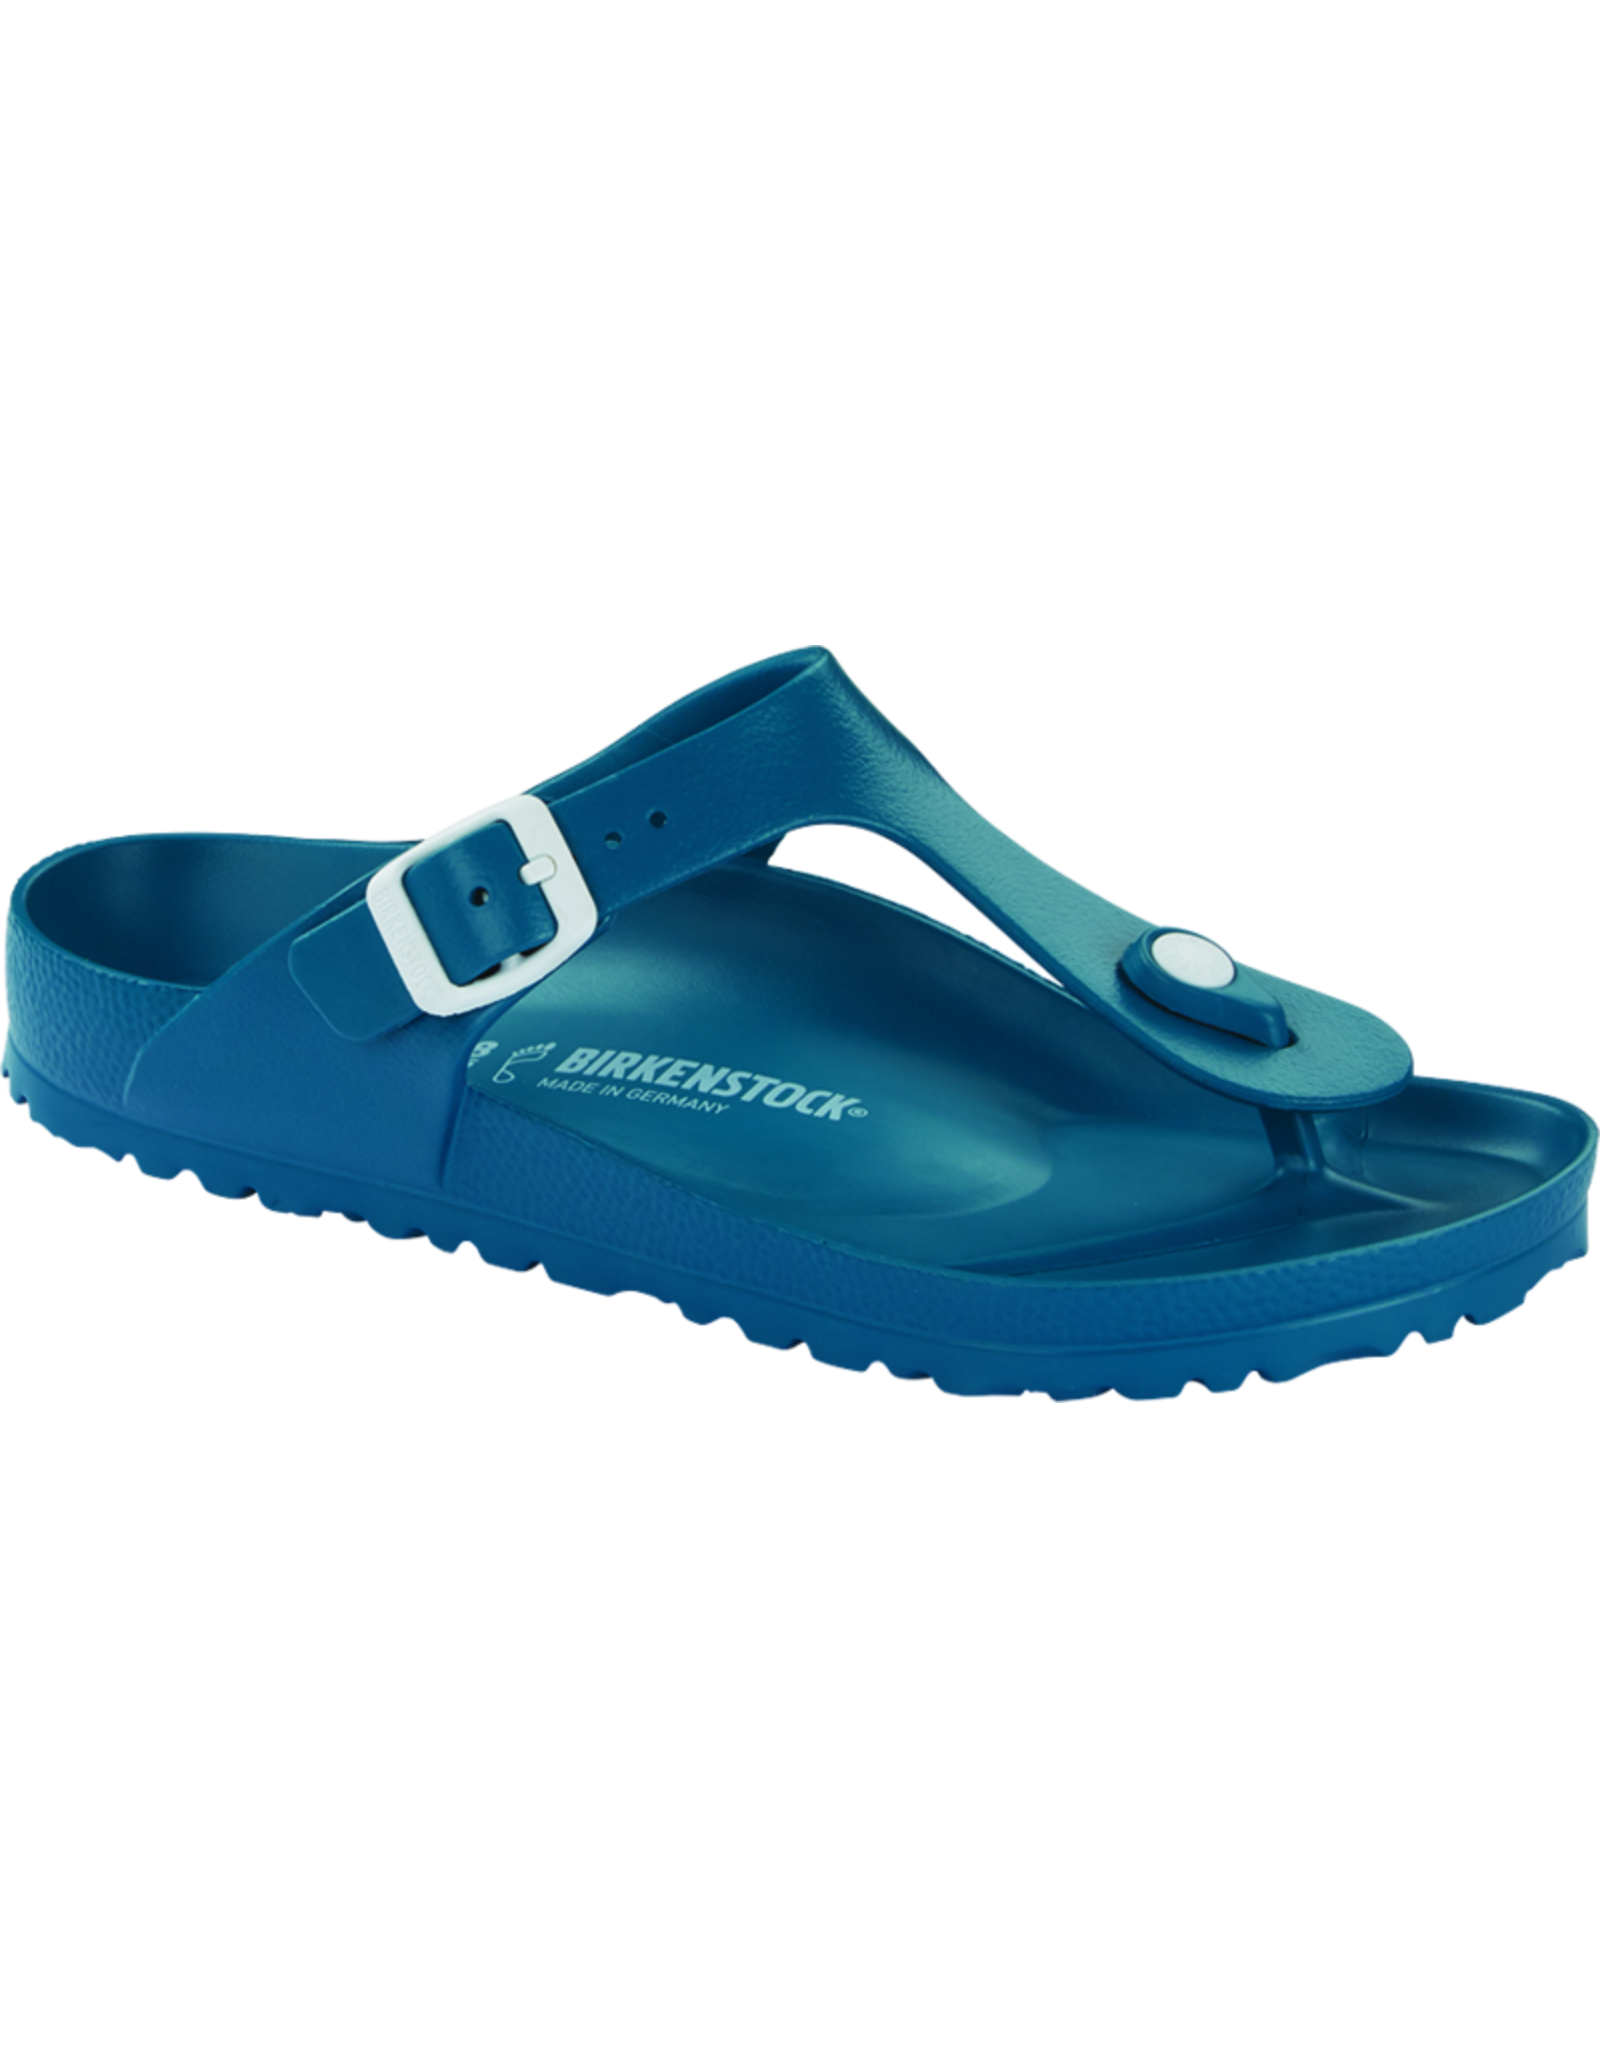 Birkenstock Gizeh EVA Sandal Turquoise